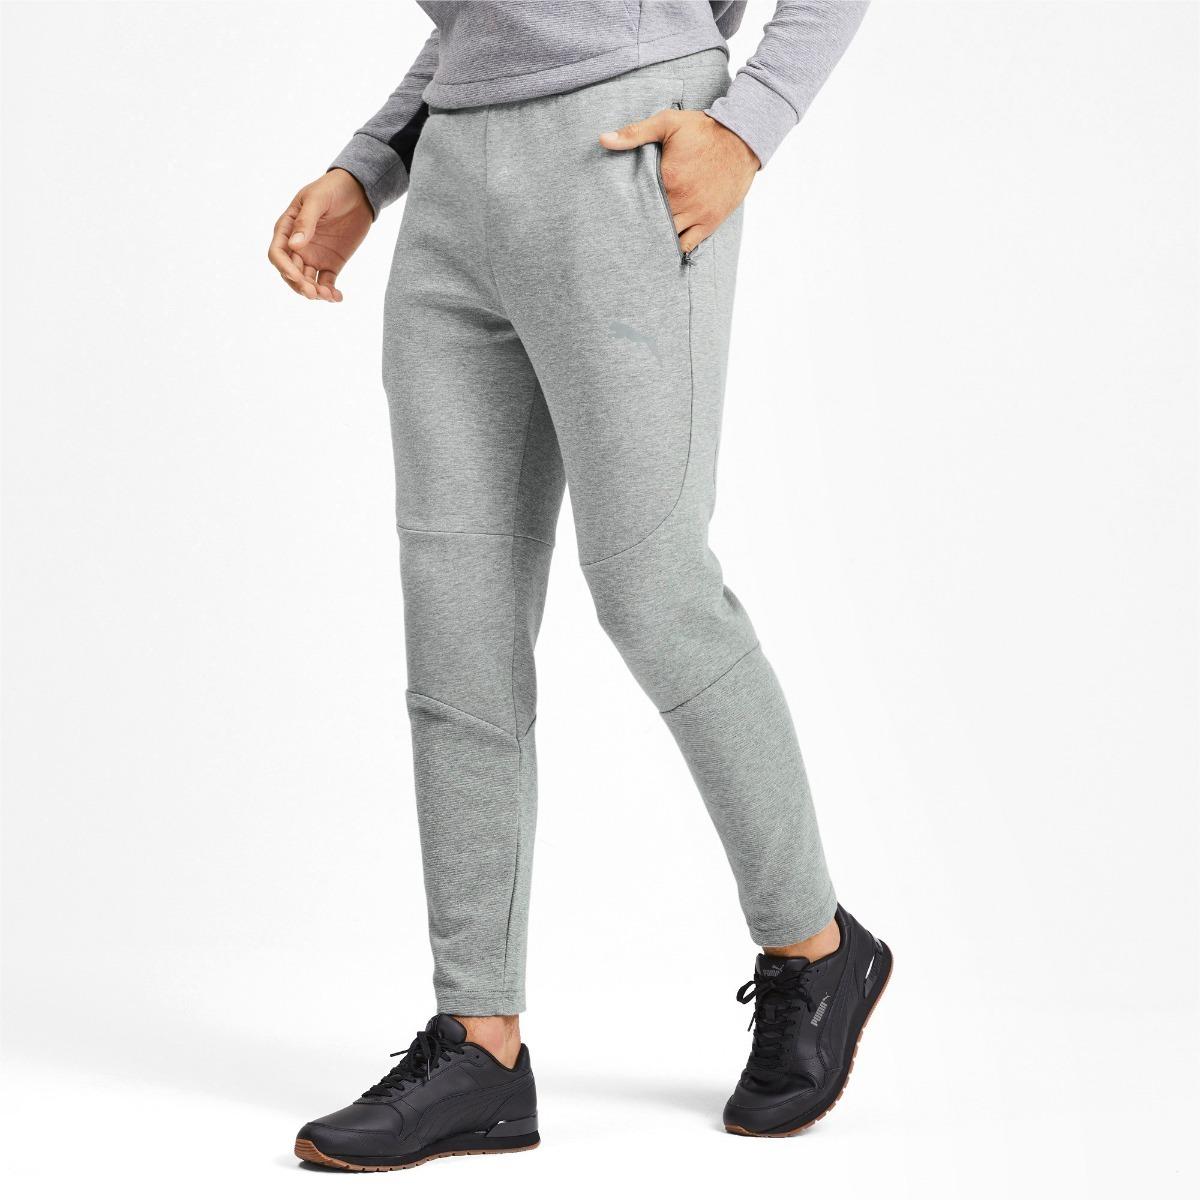 Pantalon Puma Evostripe Gri De Hombre